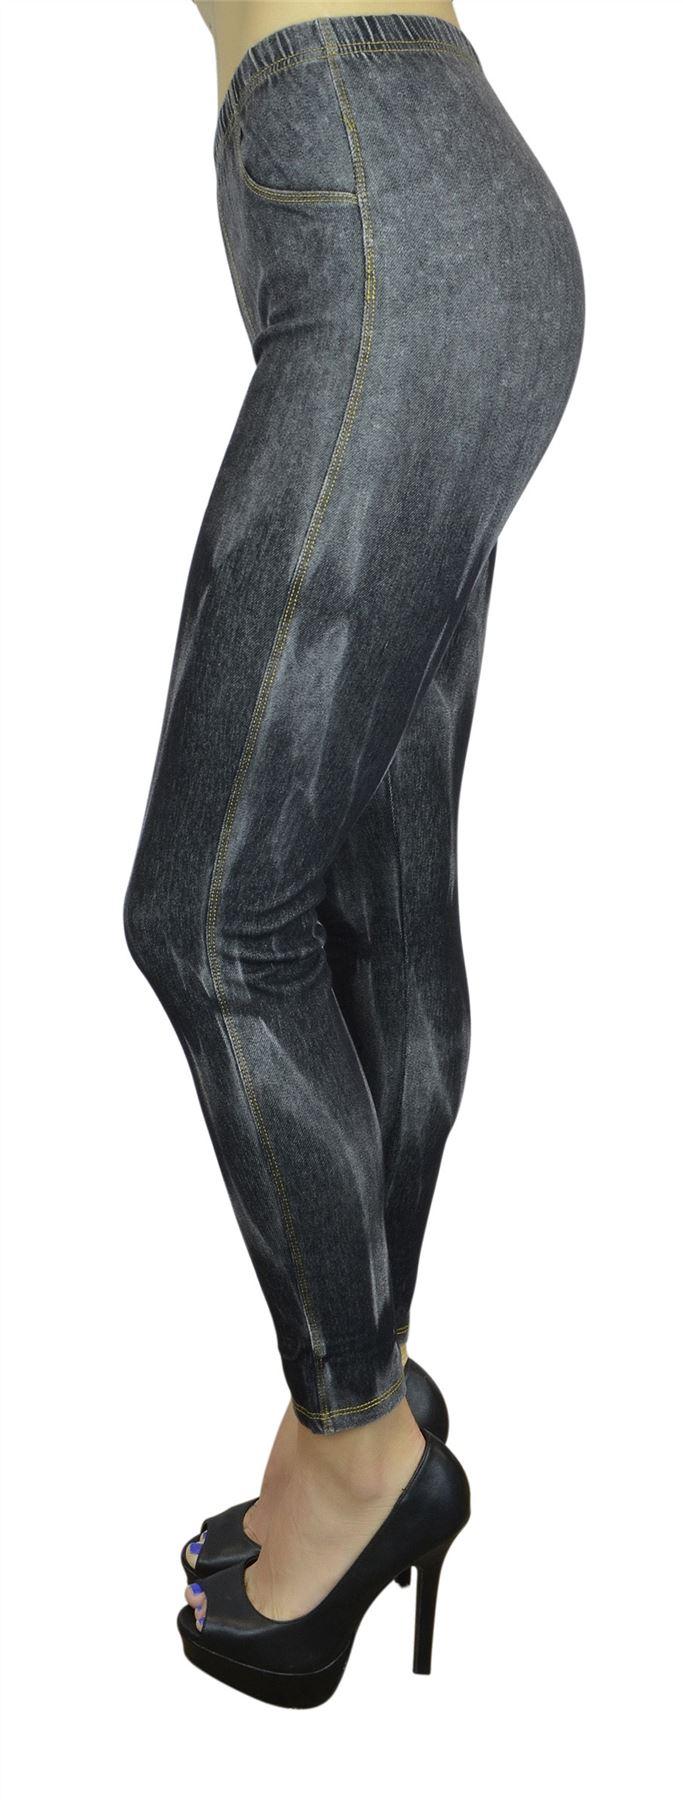 Belle Donne Women's Legging Jeggings Footless - Flecked Distressed Black